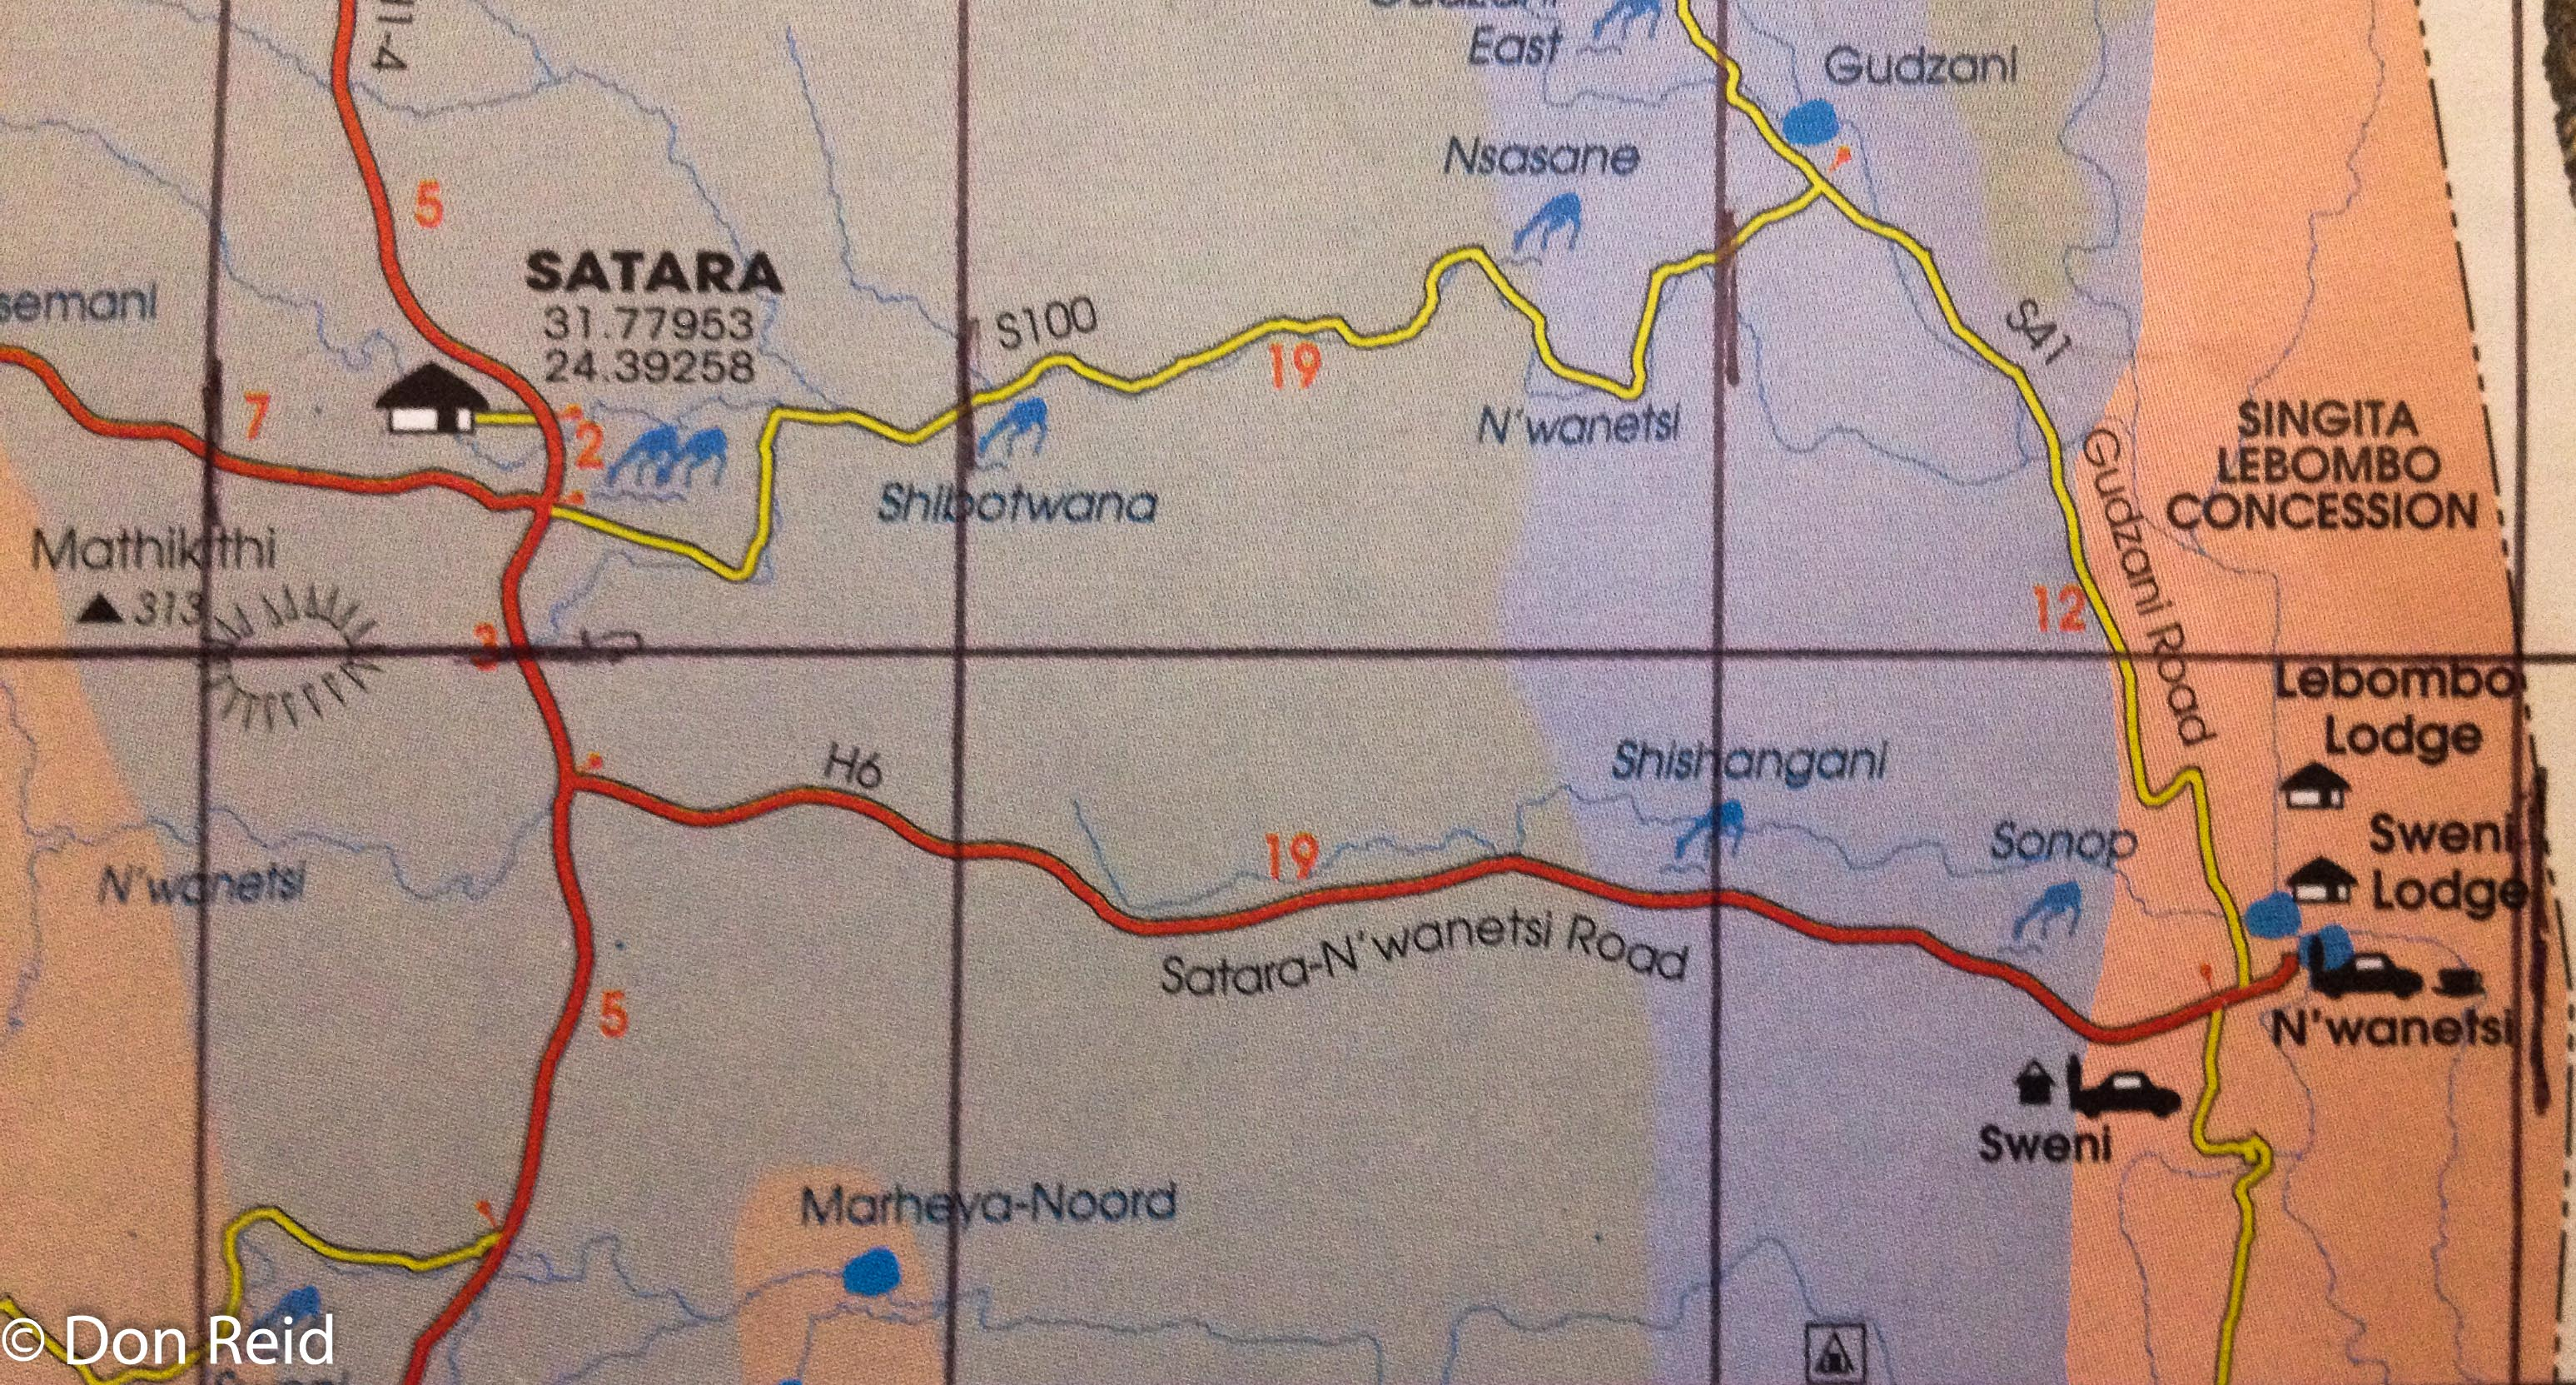 A Week in Kruger – Satara to Nwanetsi | Mostly Birding Satara Map Game on bilaspur map, himachal pradesh map, courtallam map, bijapur map, daman map, bareilly map, sasaram map, gwalior map, agumbe map, dhar city map, lakhimpur kheri map, ullal map, anjuna beach map, sira map, sonamarg map, panhala fort map, sangli map, una map, sonagachi map, khanna map,